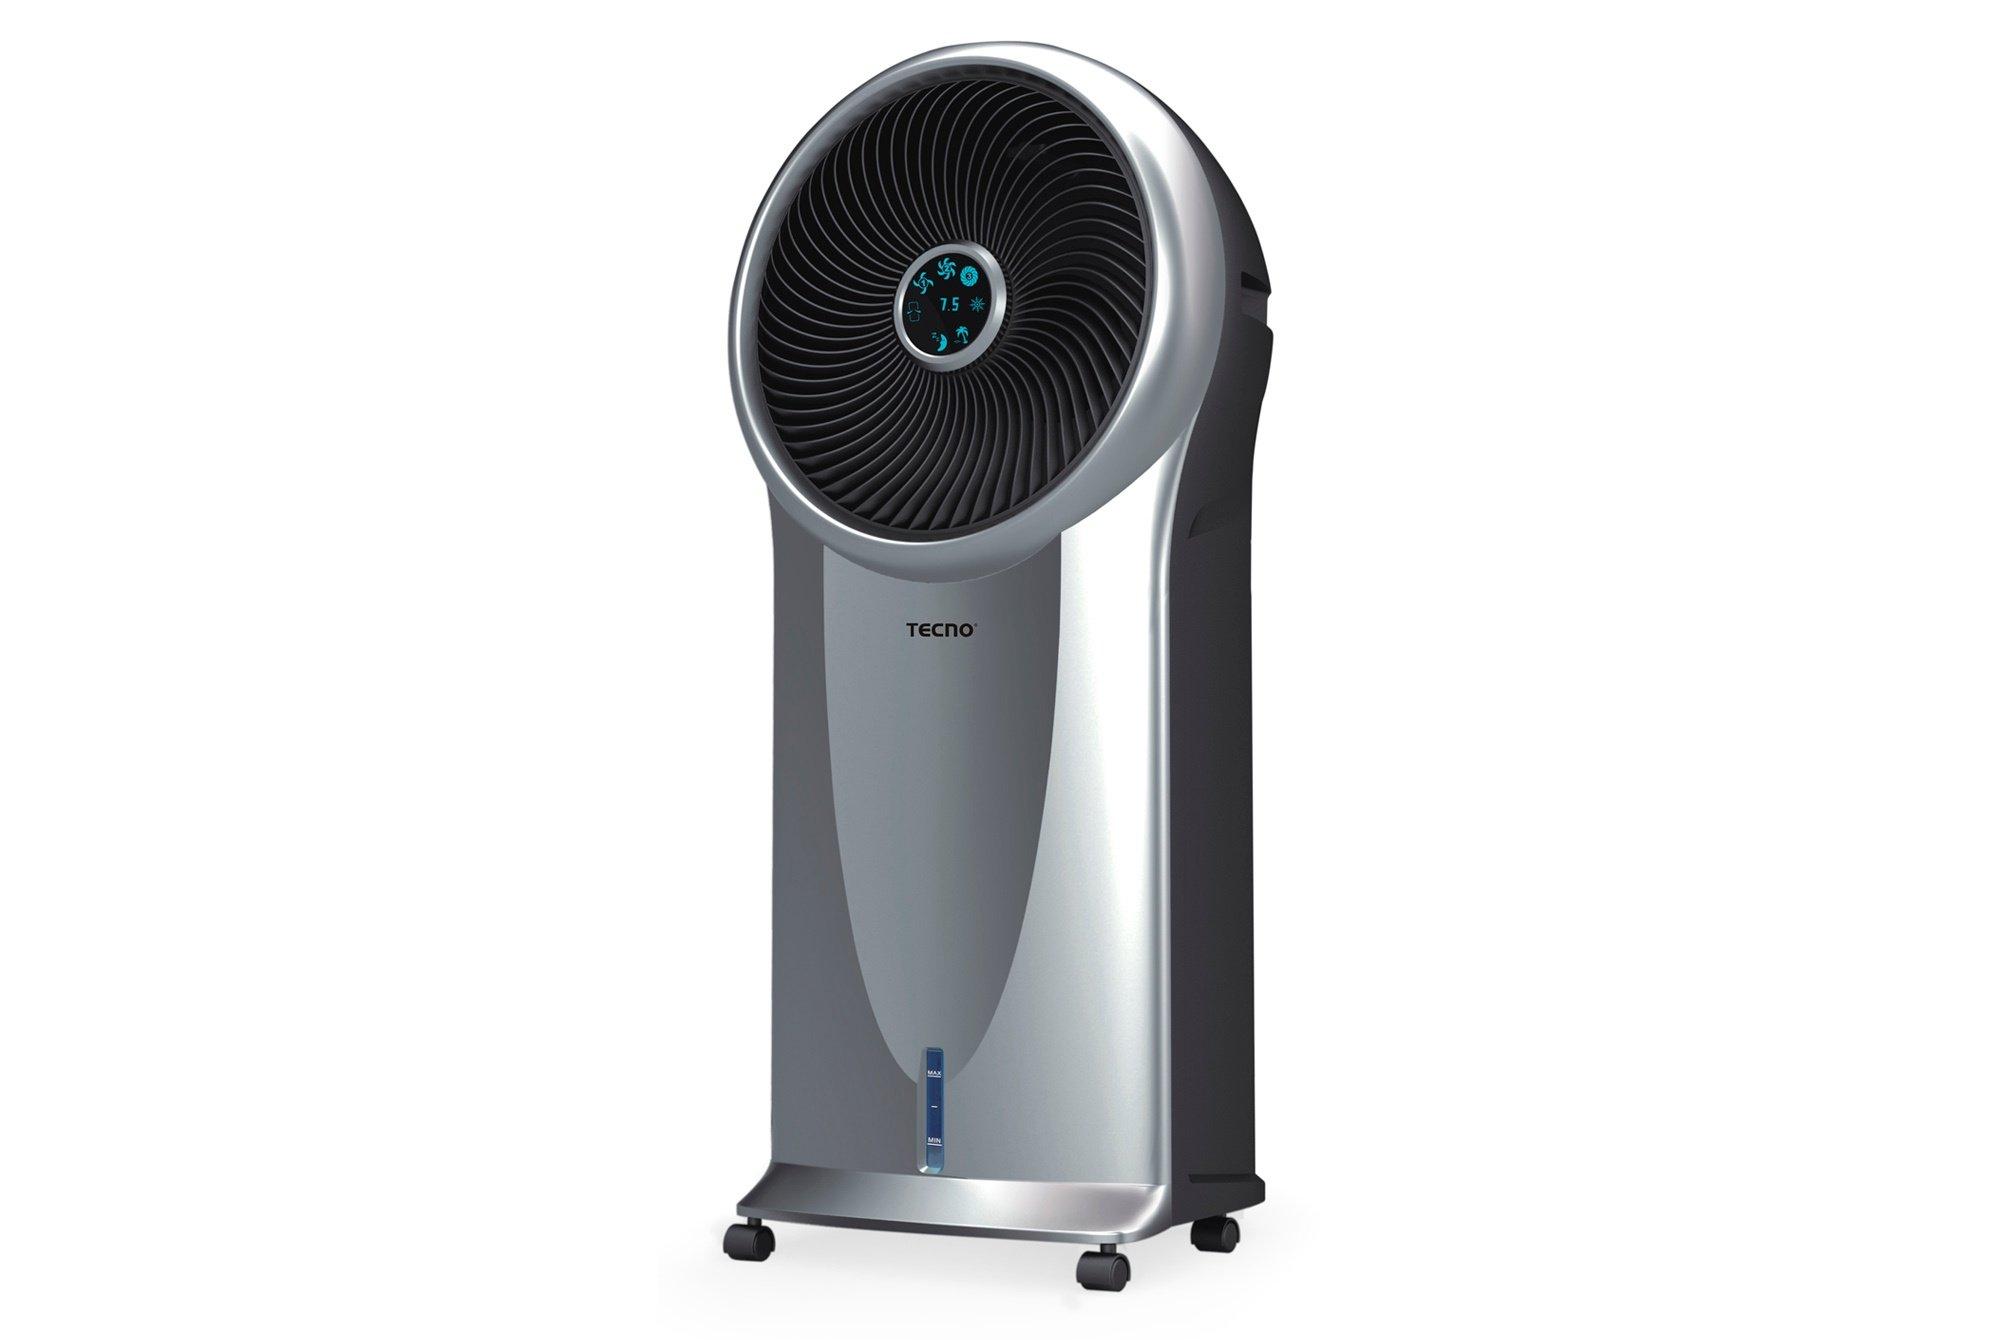 Tecno TAF 2901 Turbo Fan Air Cooler appliance holiday gifting ideas singapore